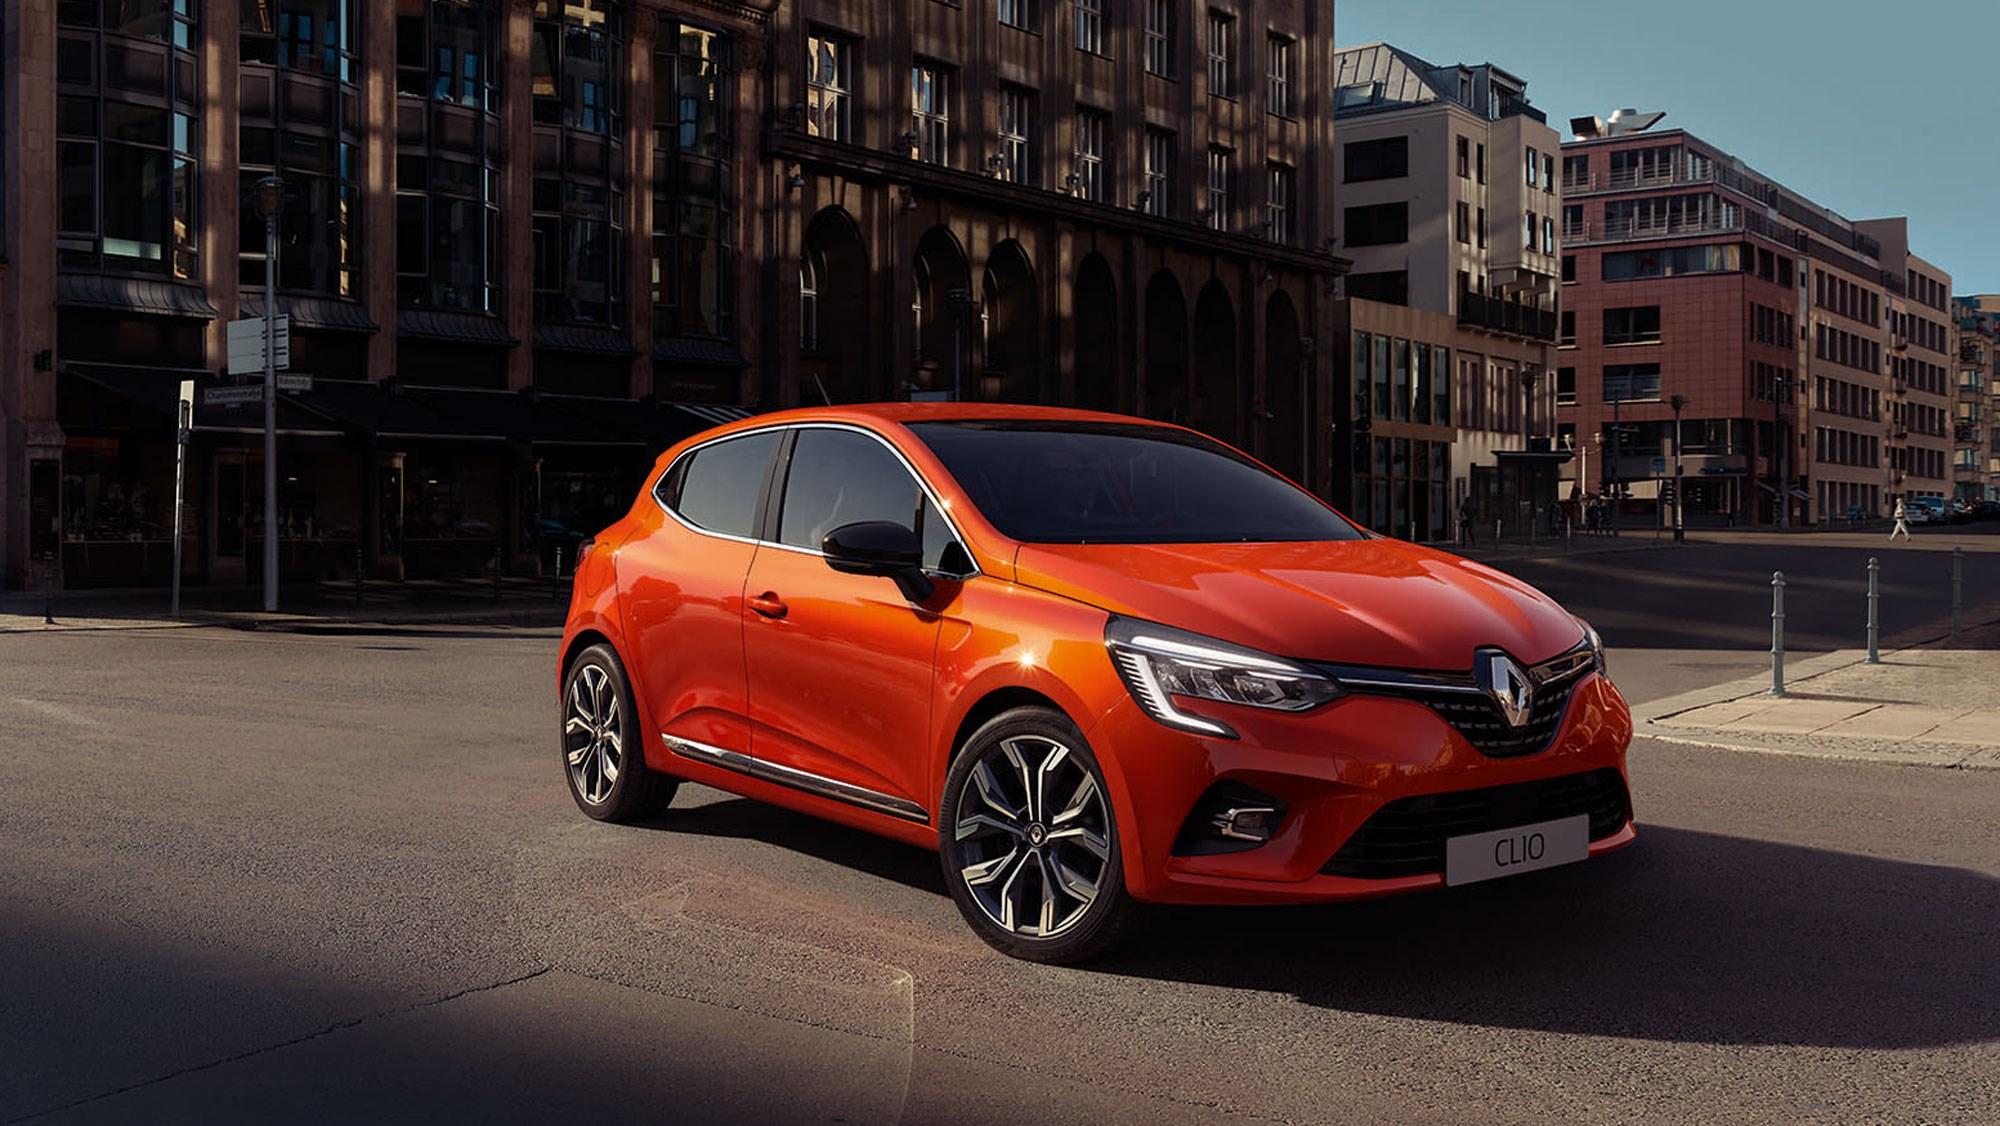 New Renault Clio: Fresh Pictures Of More Premium Hatch